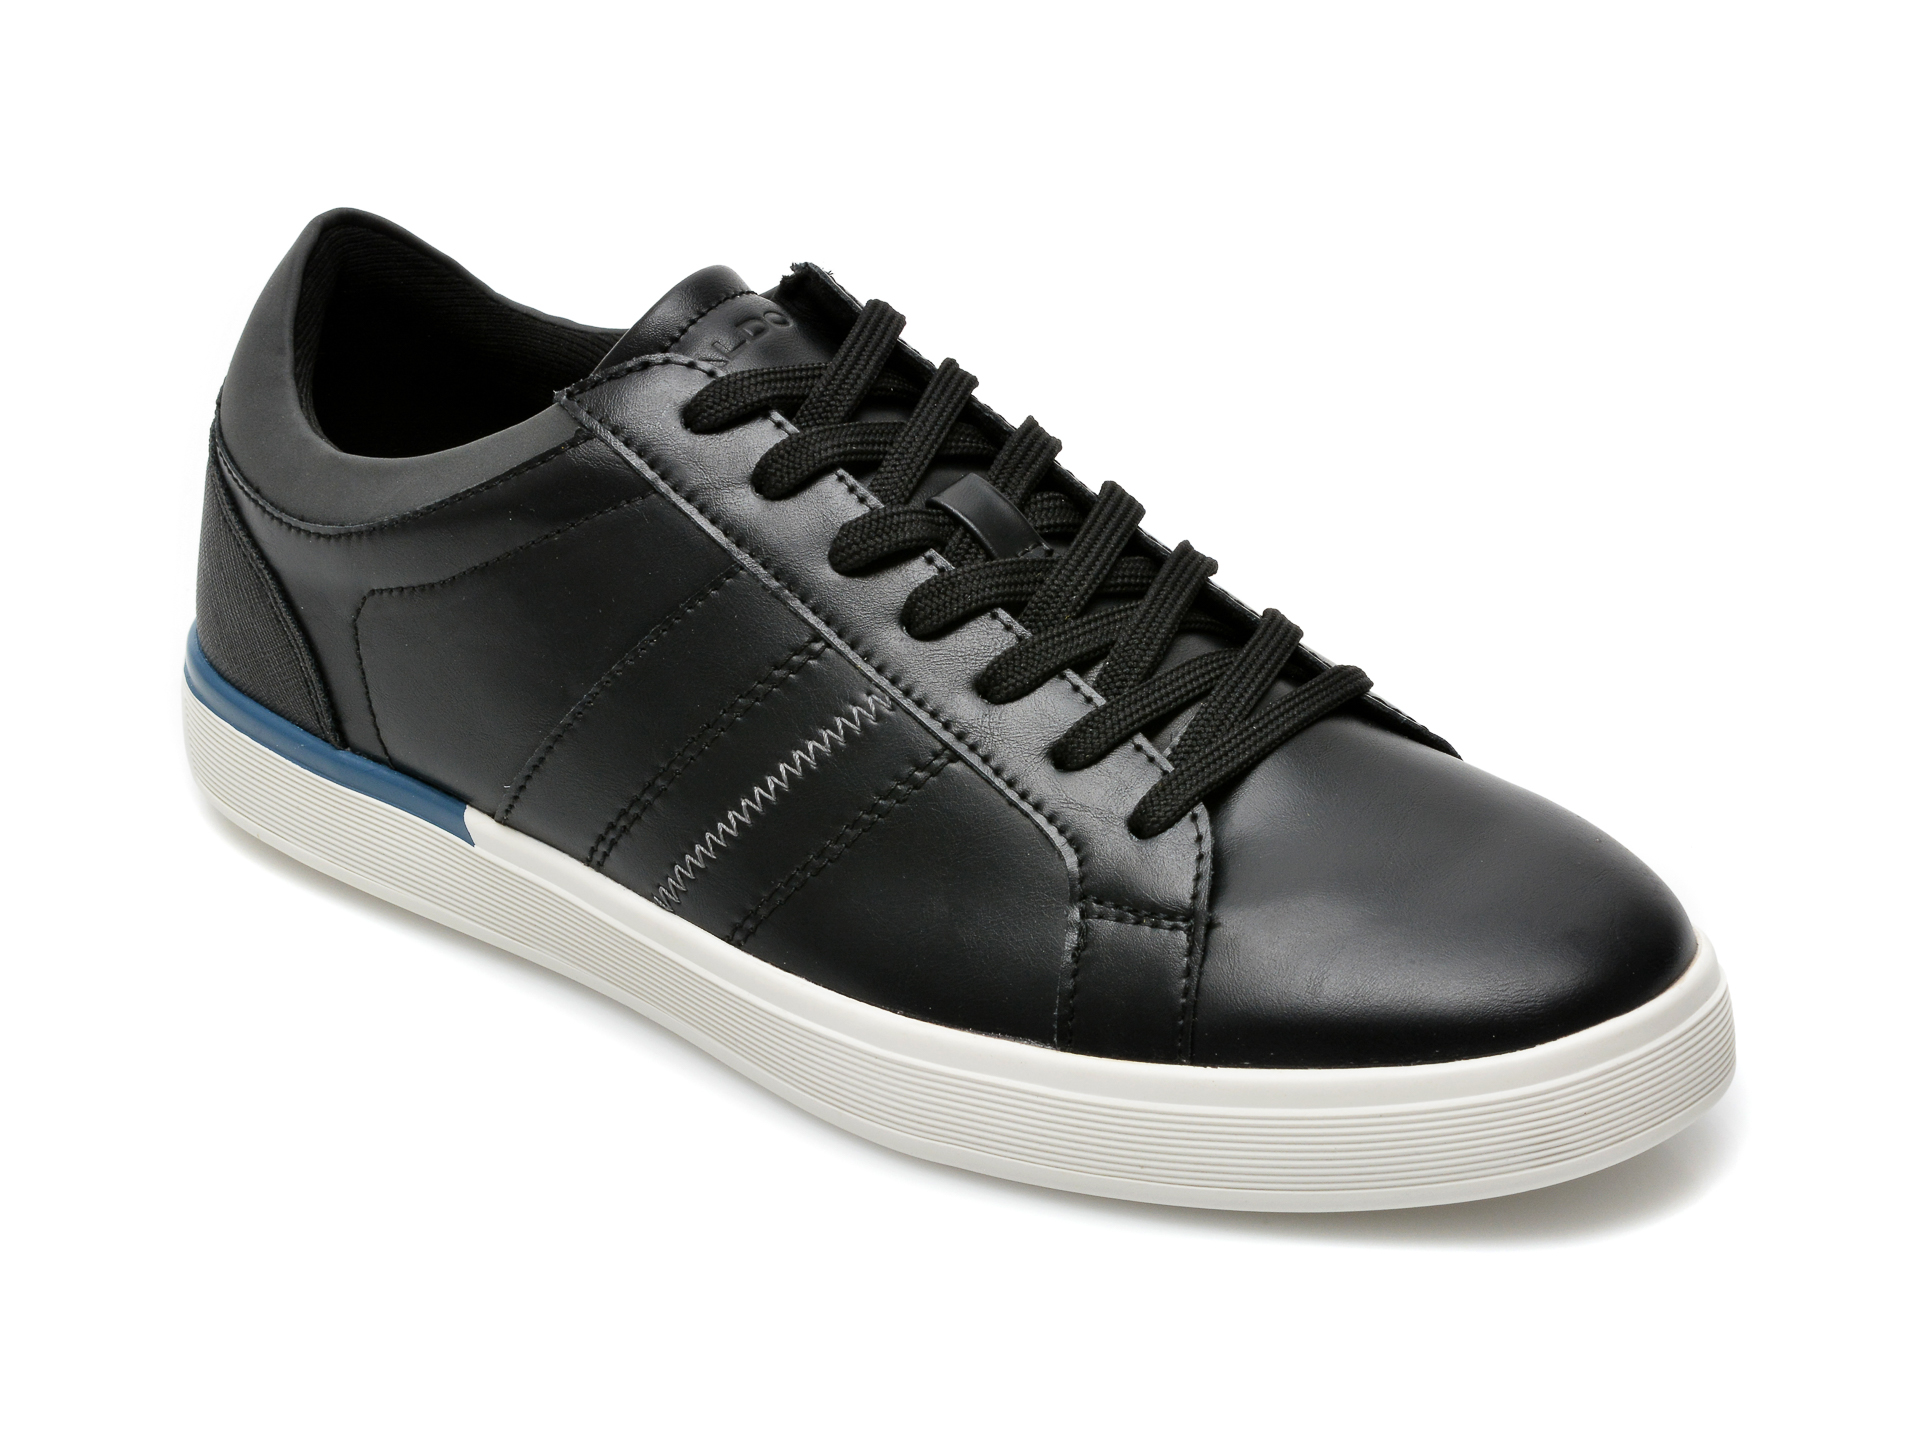 Pantofi ALDO negri, Tucuman001, din piele ecologica imagine otter.ro 2021